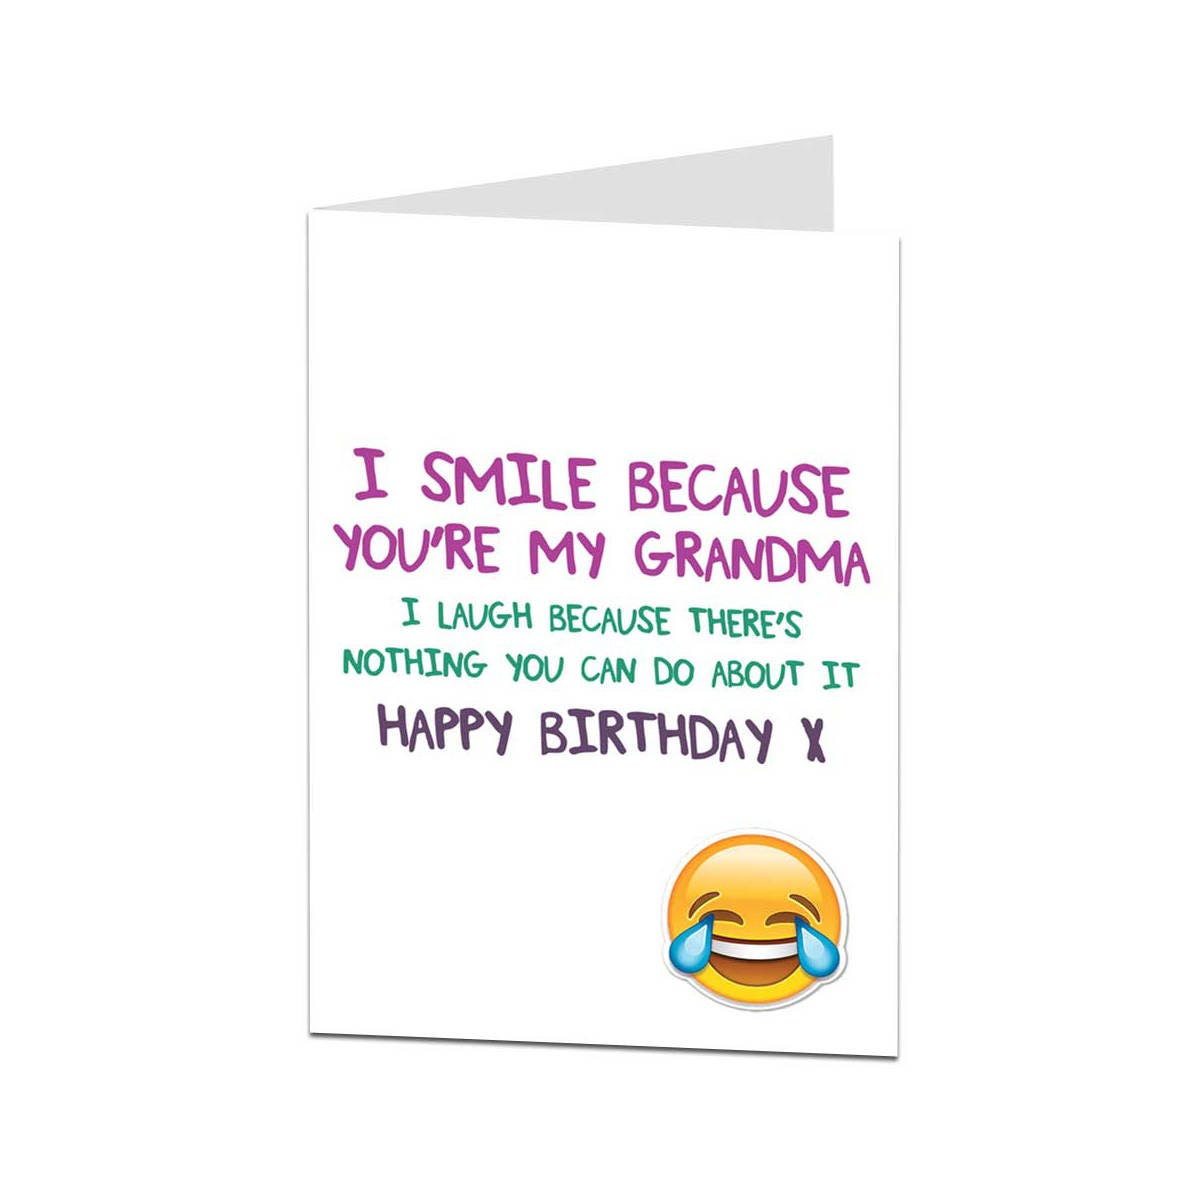 Grandma card birthday card grandma happy birthday grandma description grandma card birthday kristyandbryce Images